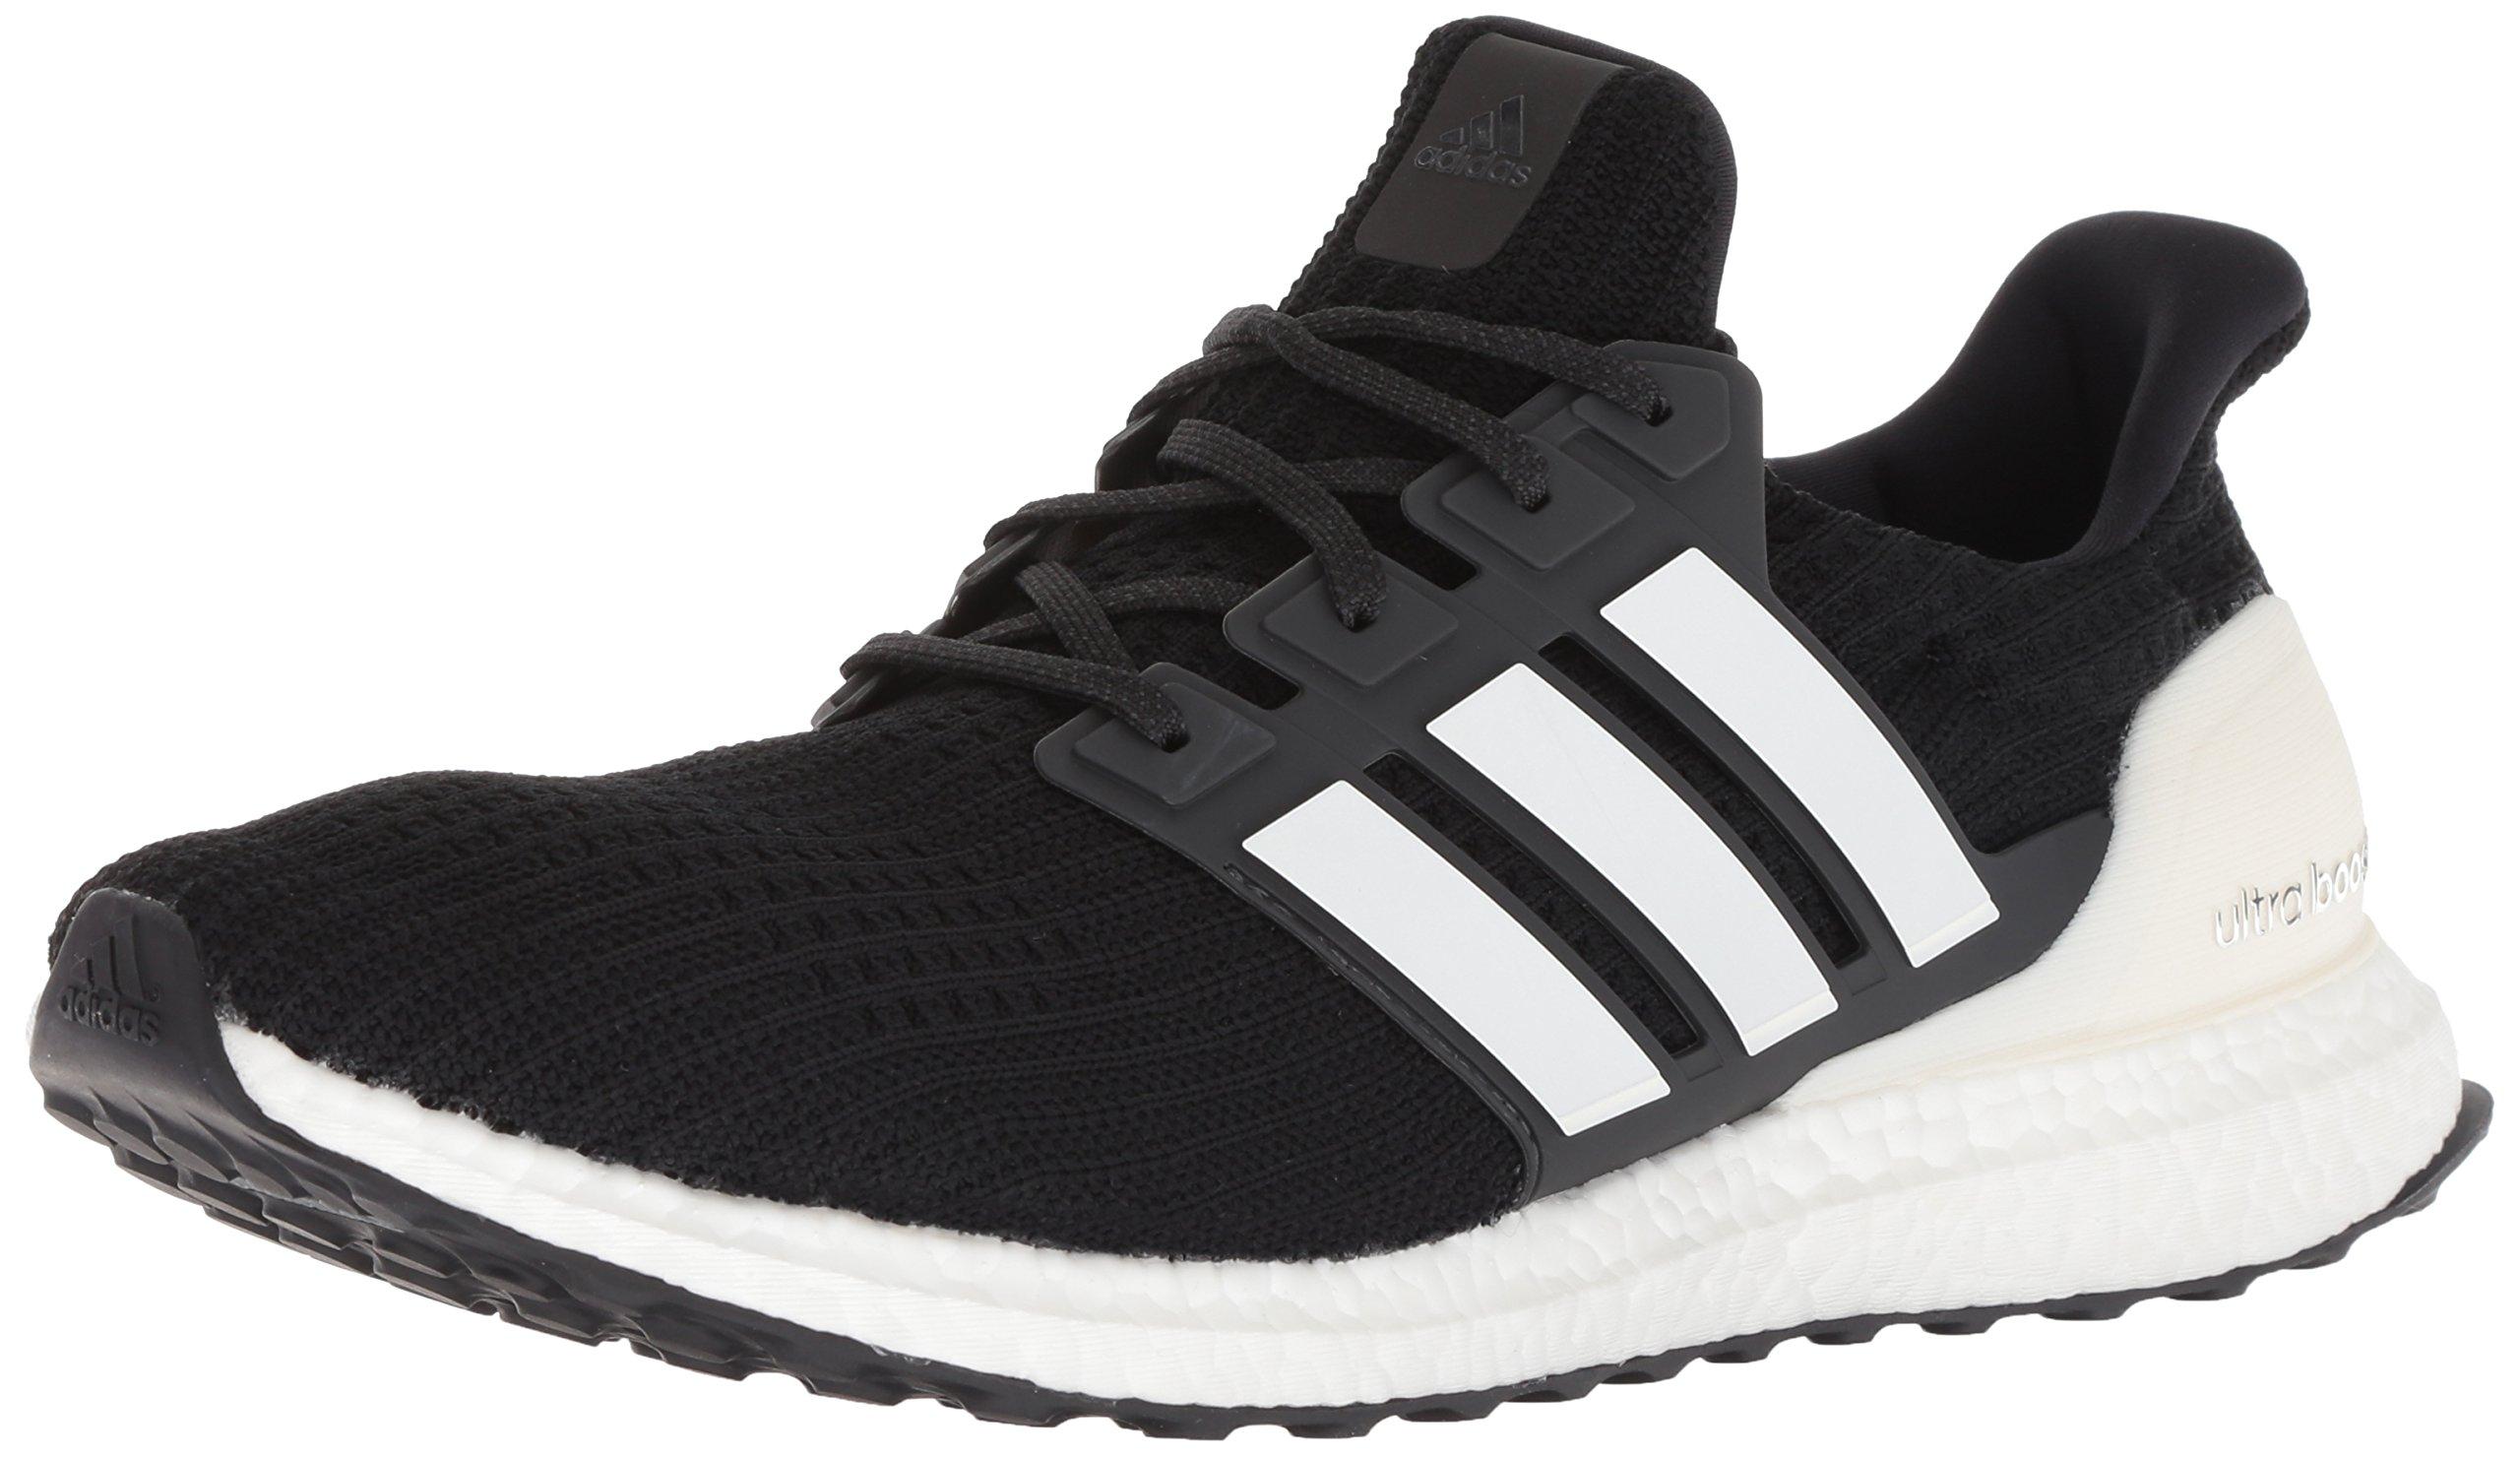 adidas Men's Ultraboost Running Shoe, Black/Cloud White/Carbon, 10 M US